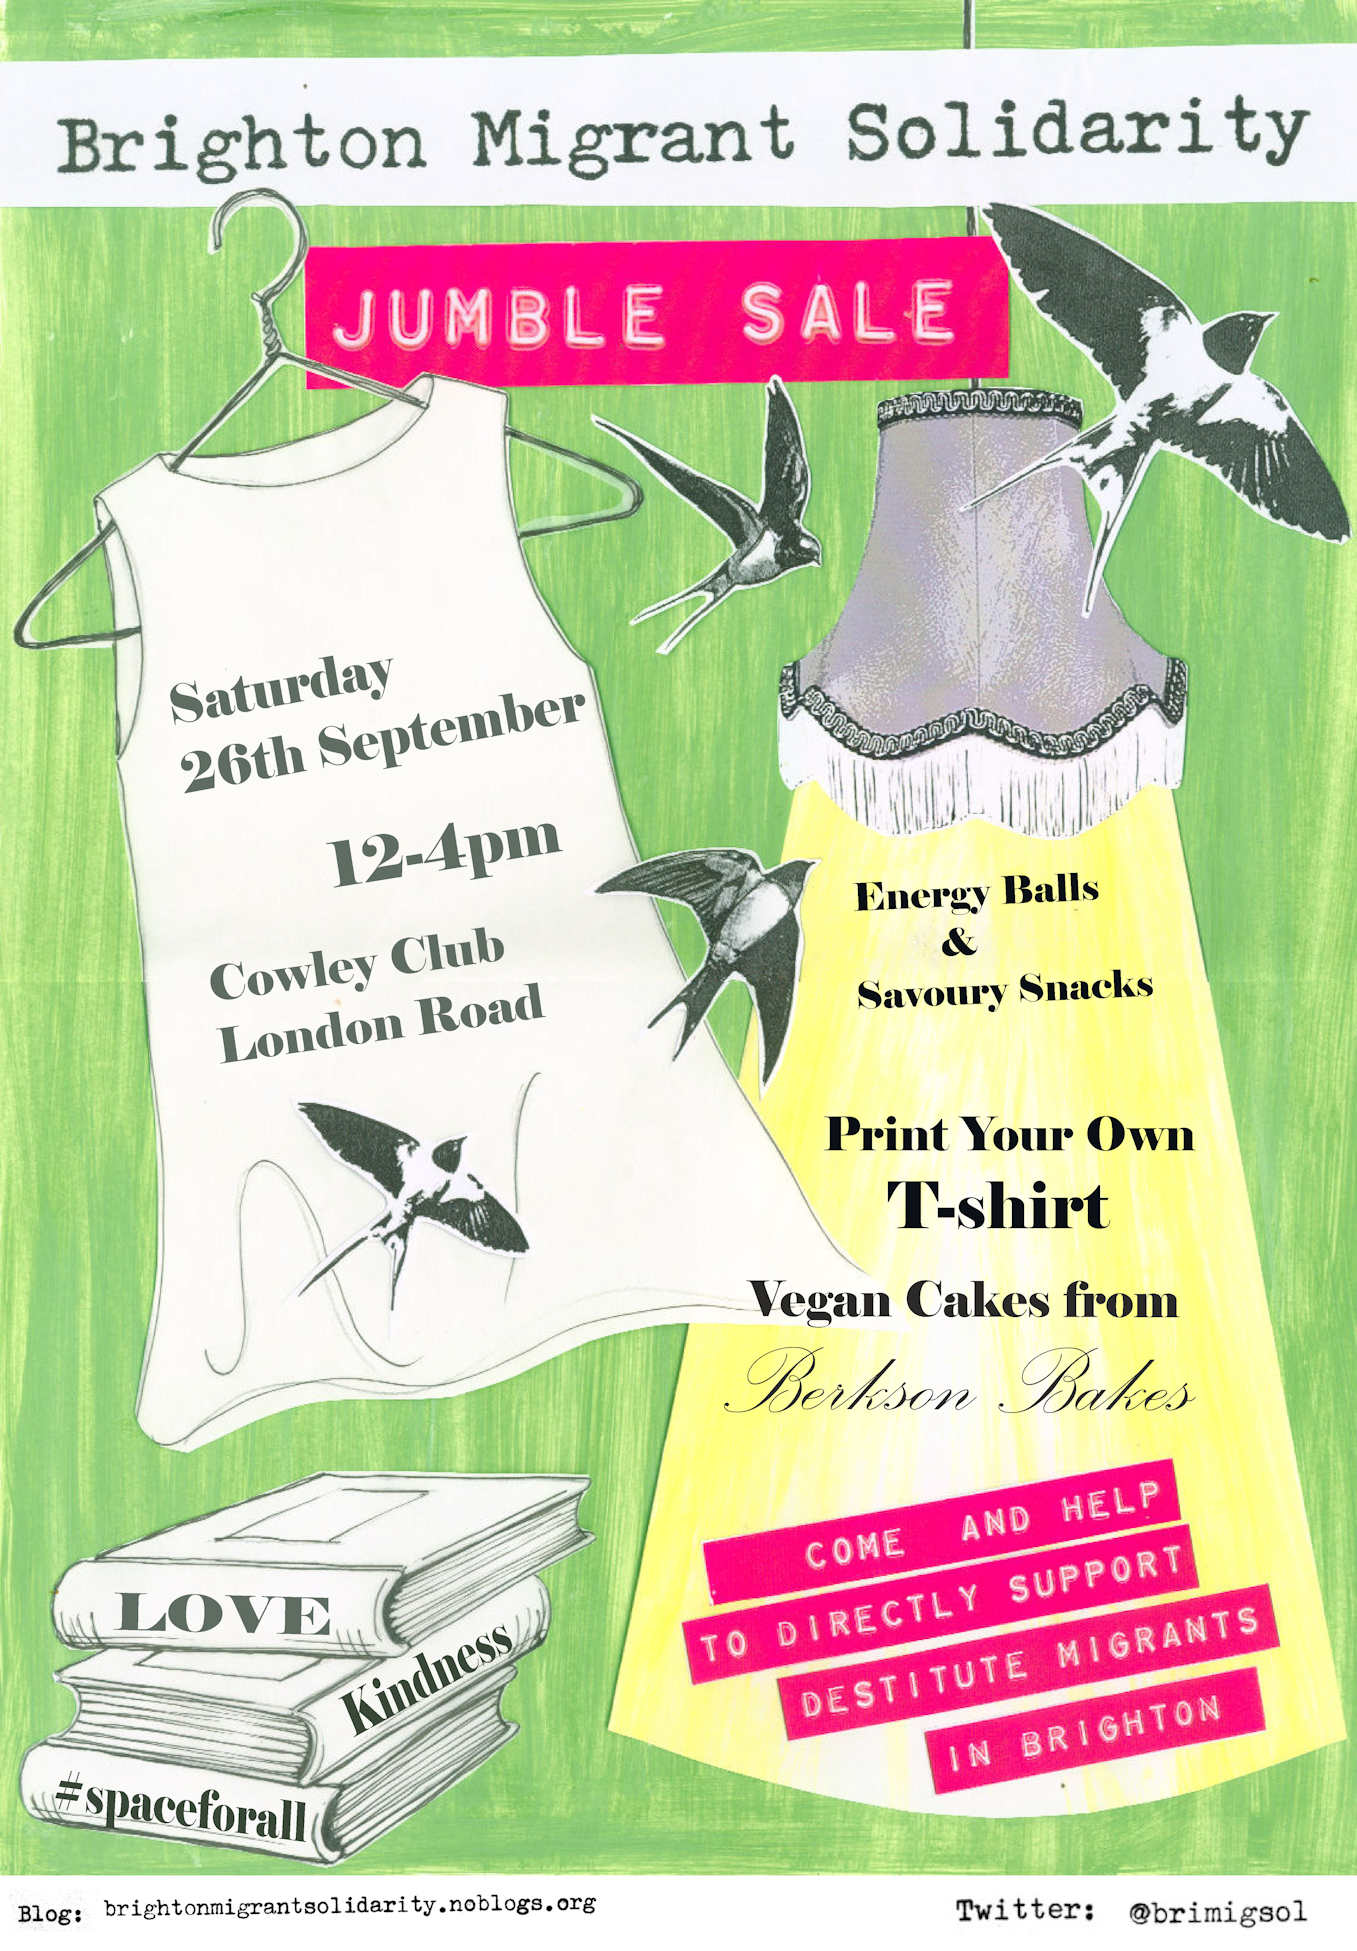 Jumble Sale Poster, 26 sept Cowley Club